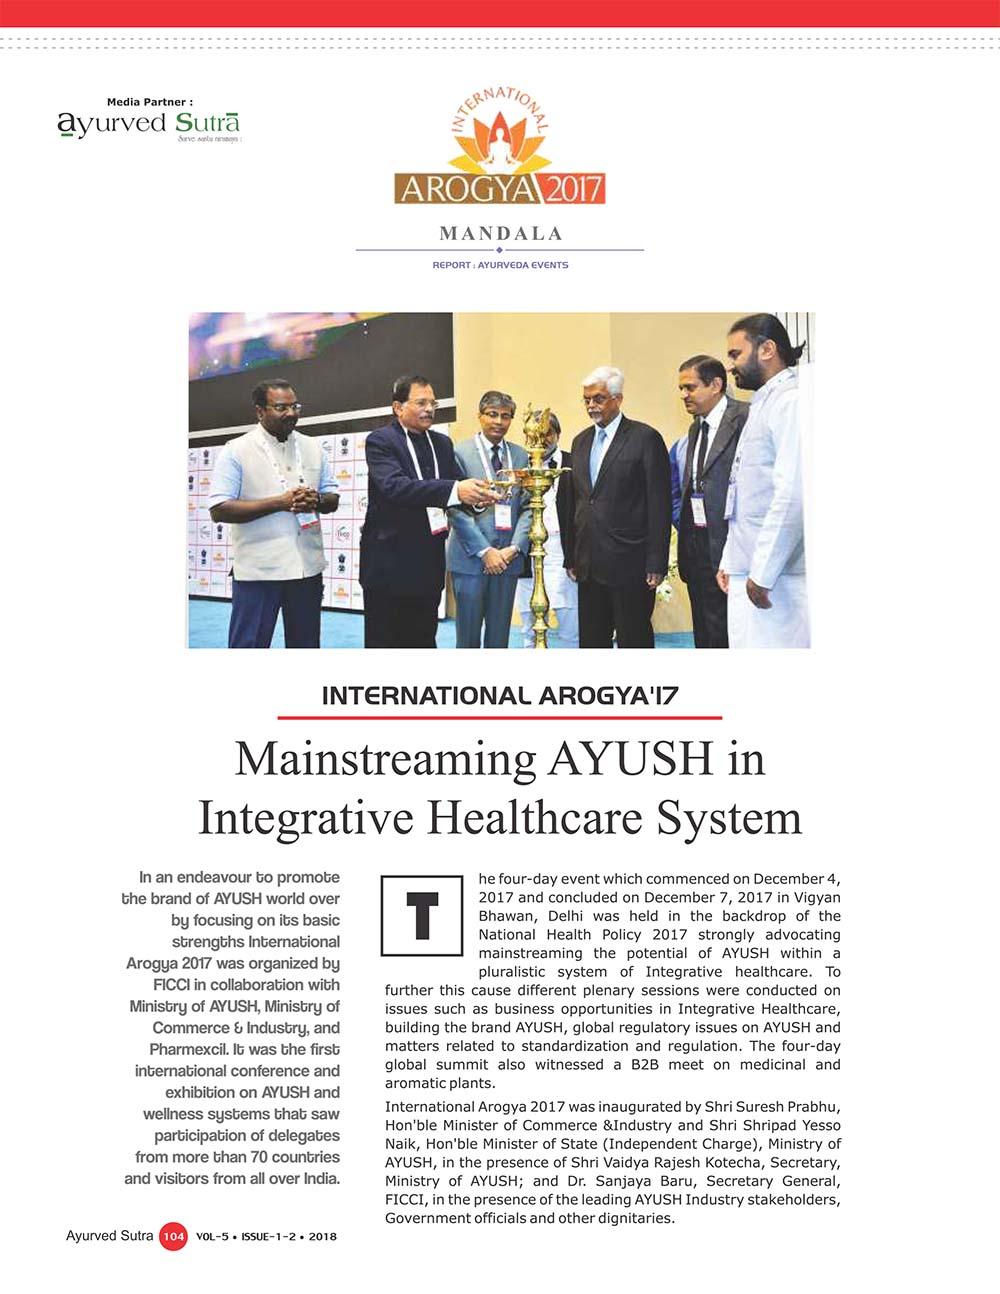 Ayurvedsutra Vol 05 issue 01 02 106 - International Arogya'17: Mainstreaming AYUSH in Integrative Healthcare System